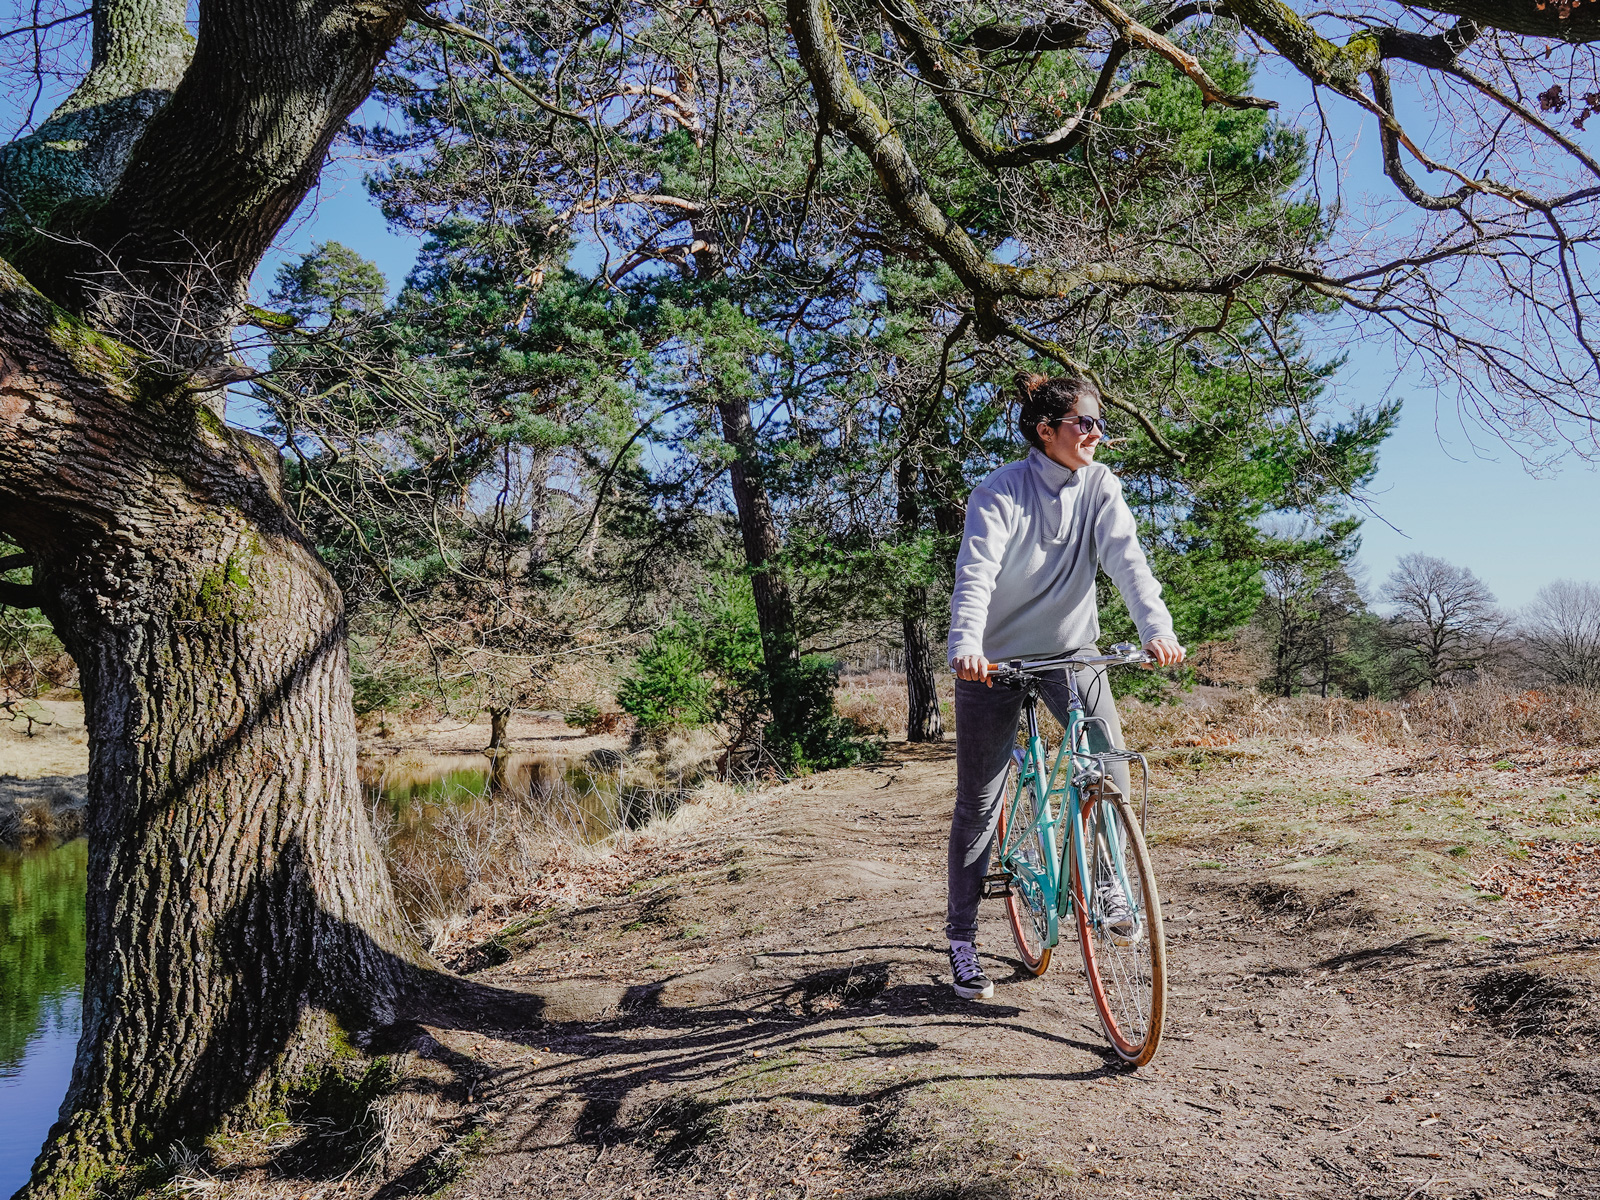 E-Bike - Ja oder nein? - Reiseblog Bravebird